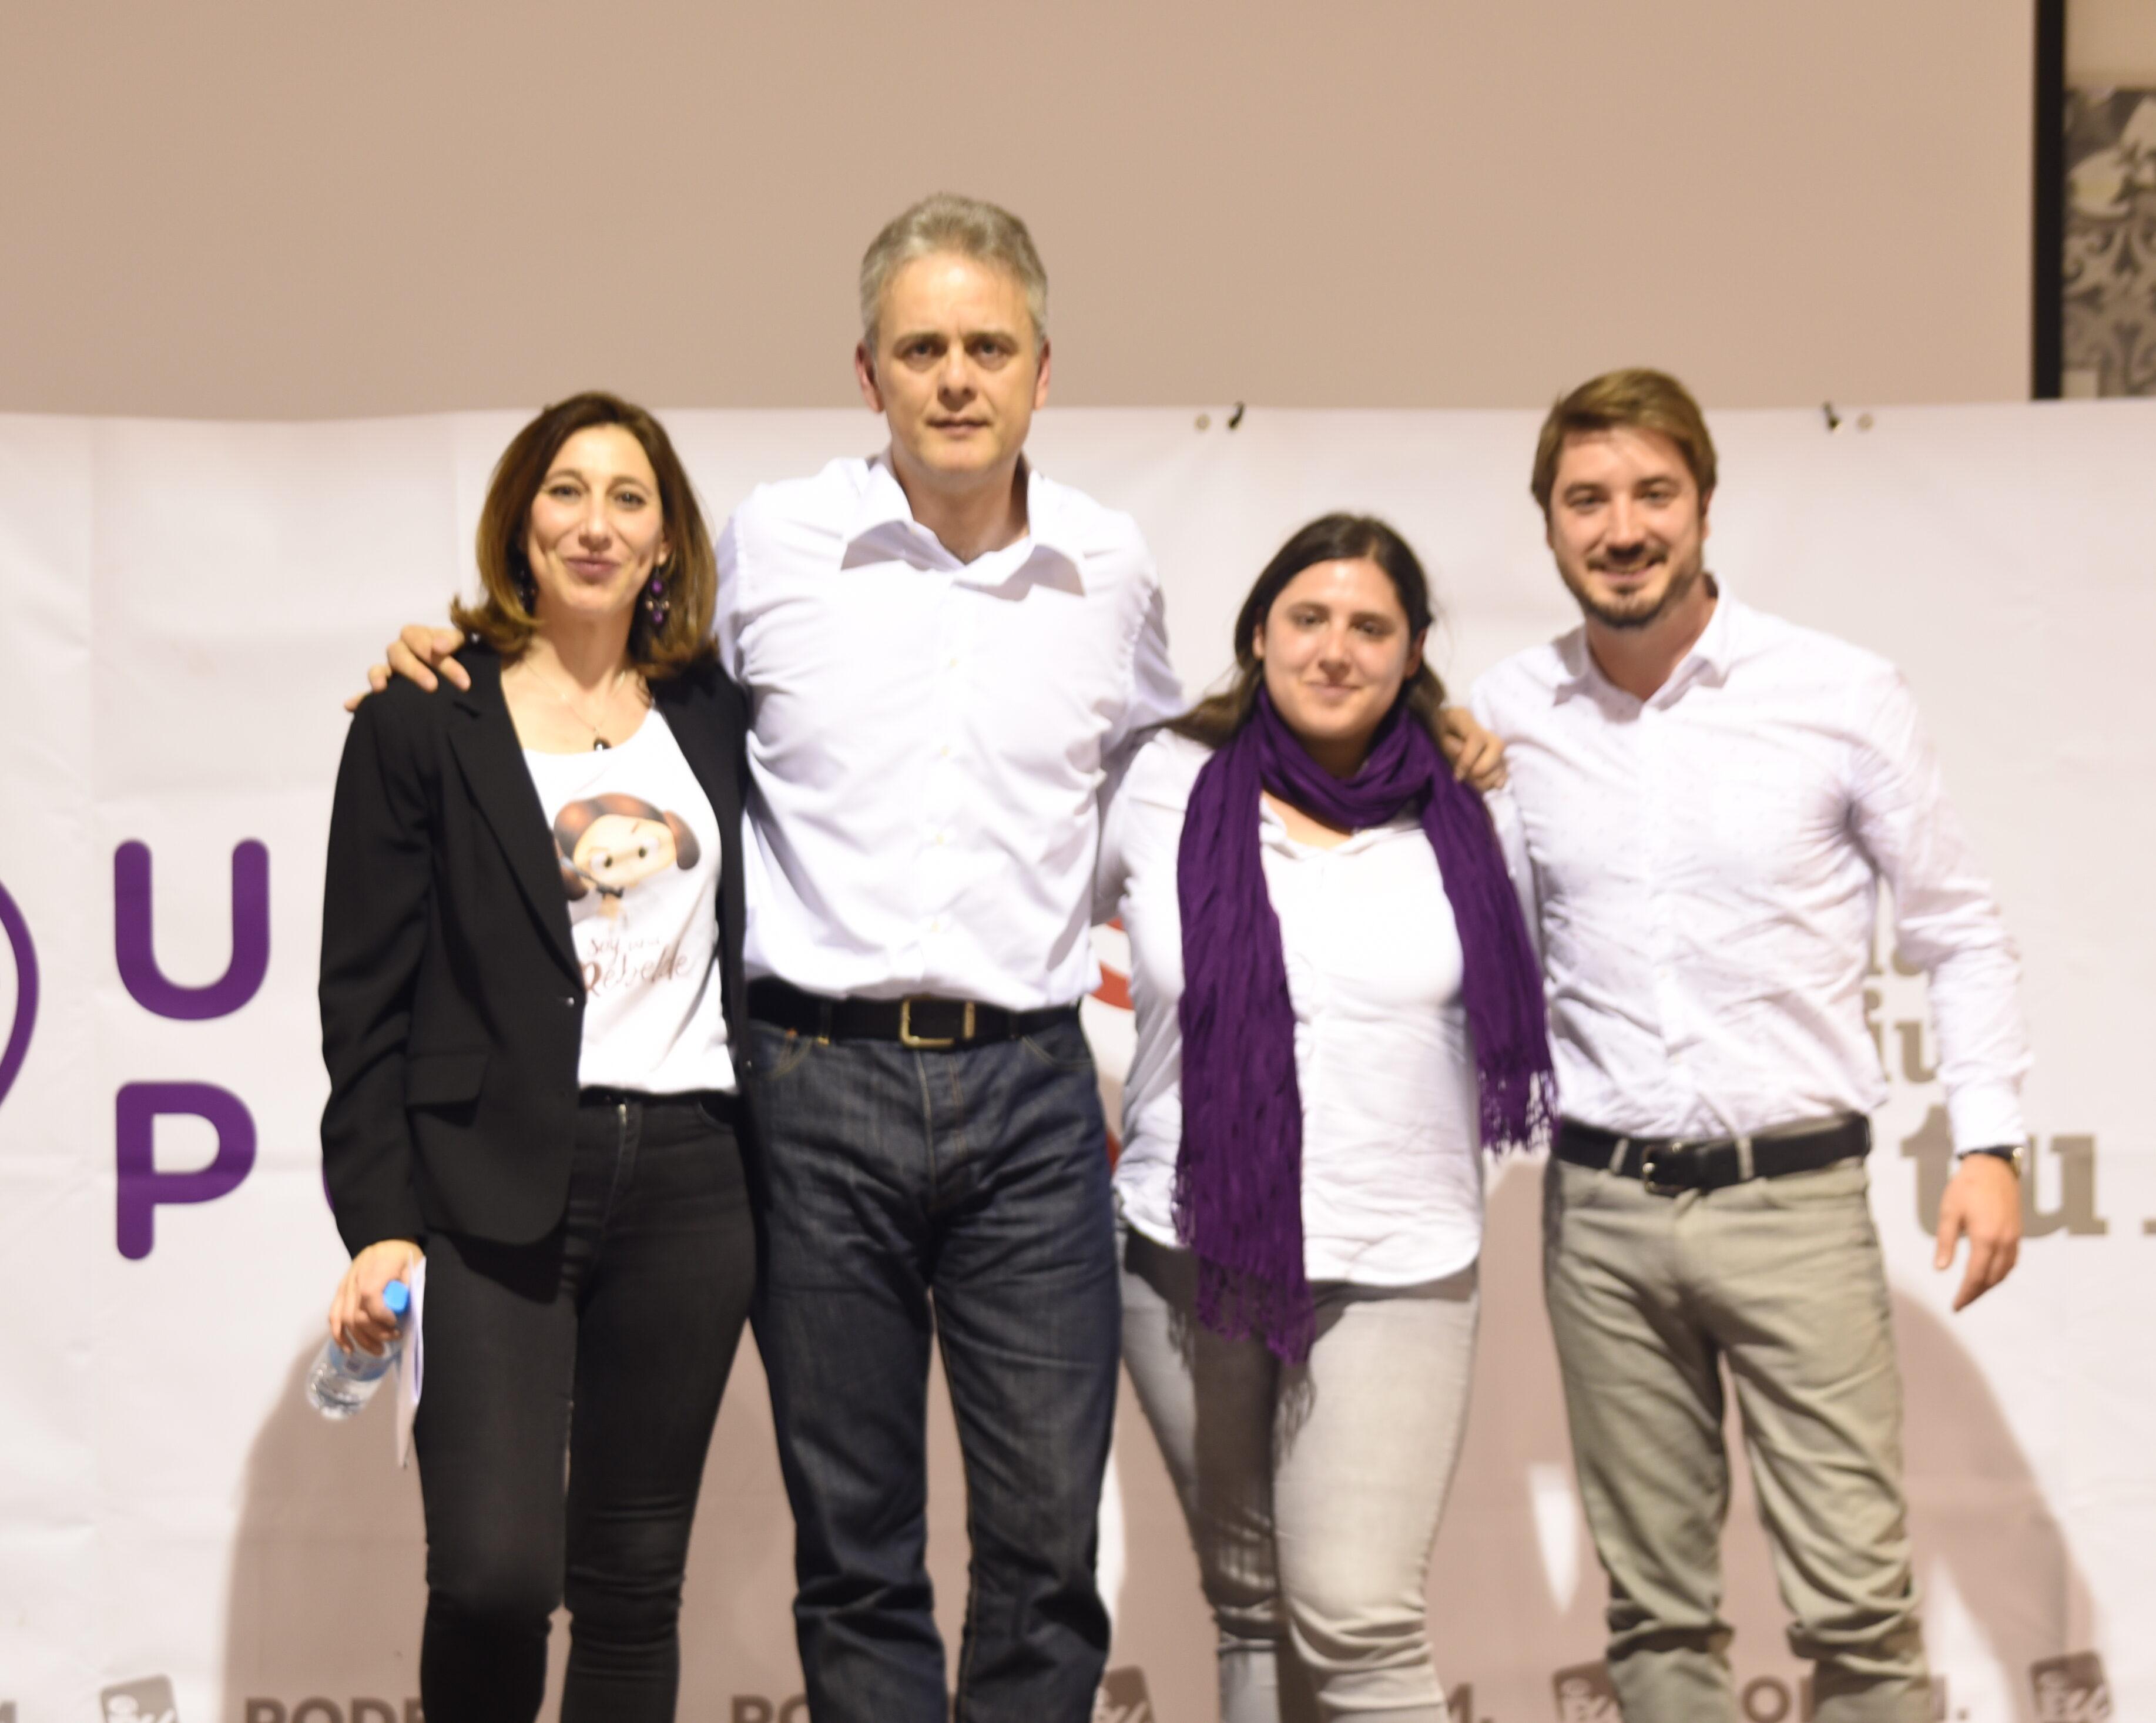 De izquierda a derecha, Mati Mas, Héctor Illueca, Roser, Maestro y Rafa Pérez.